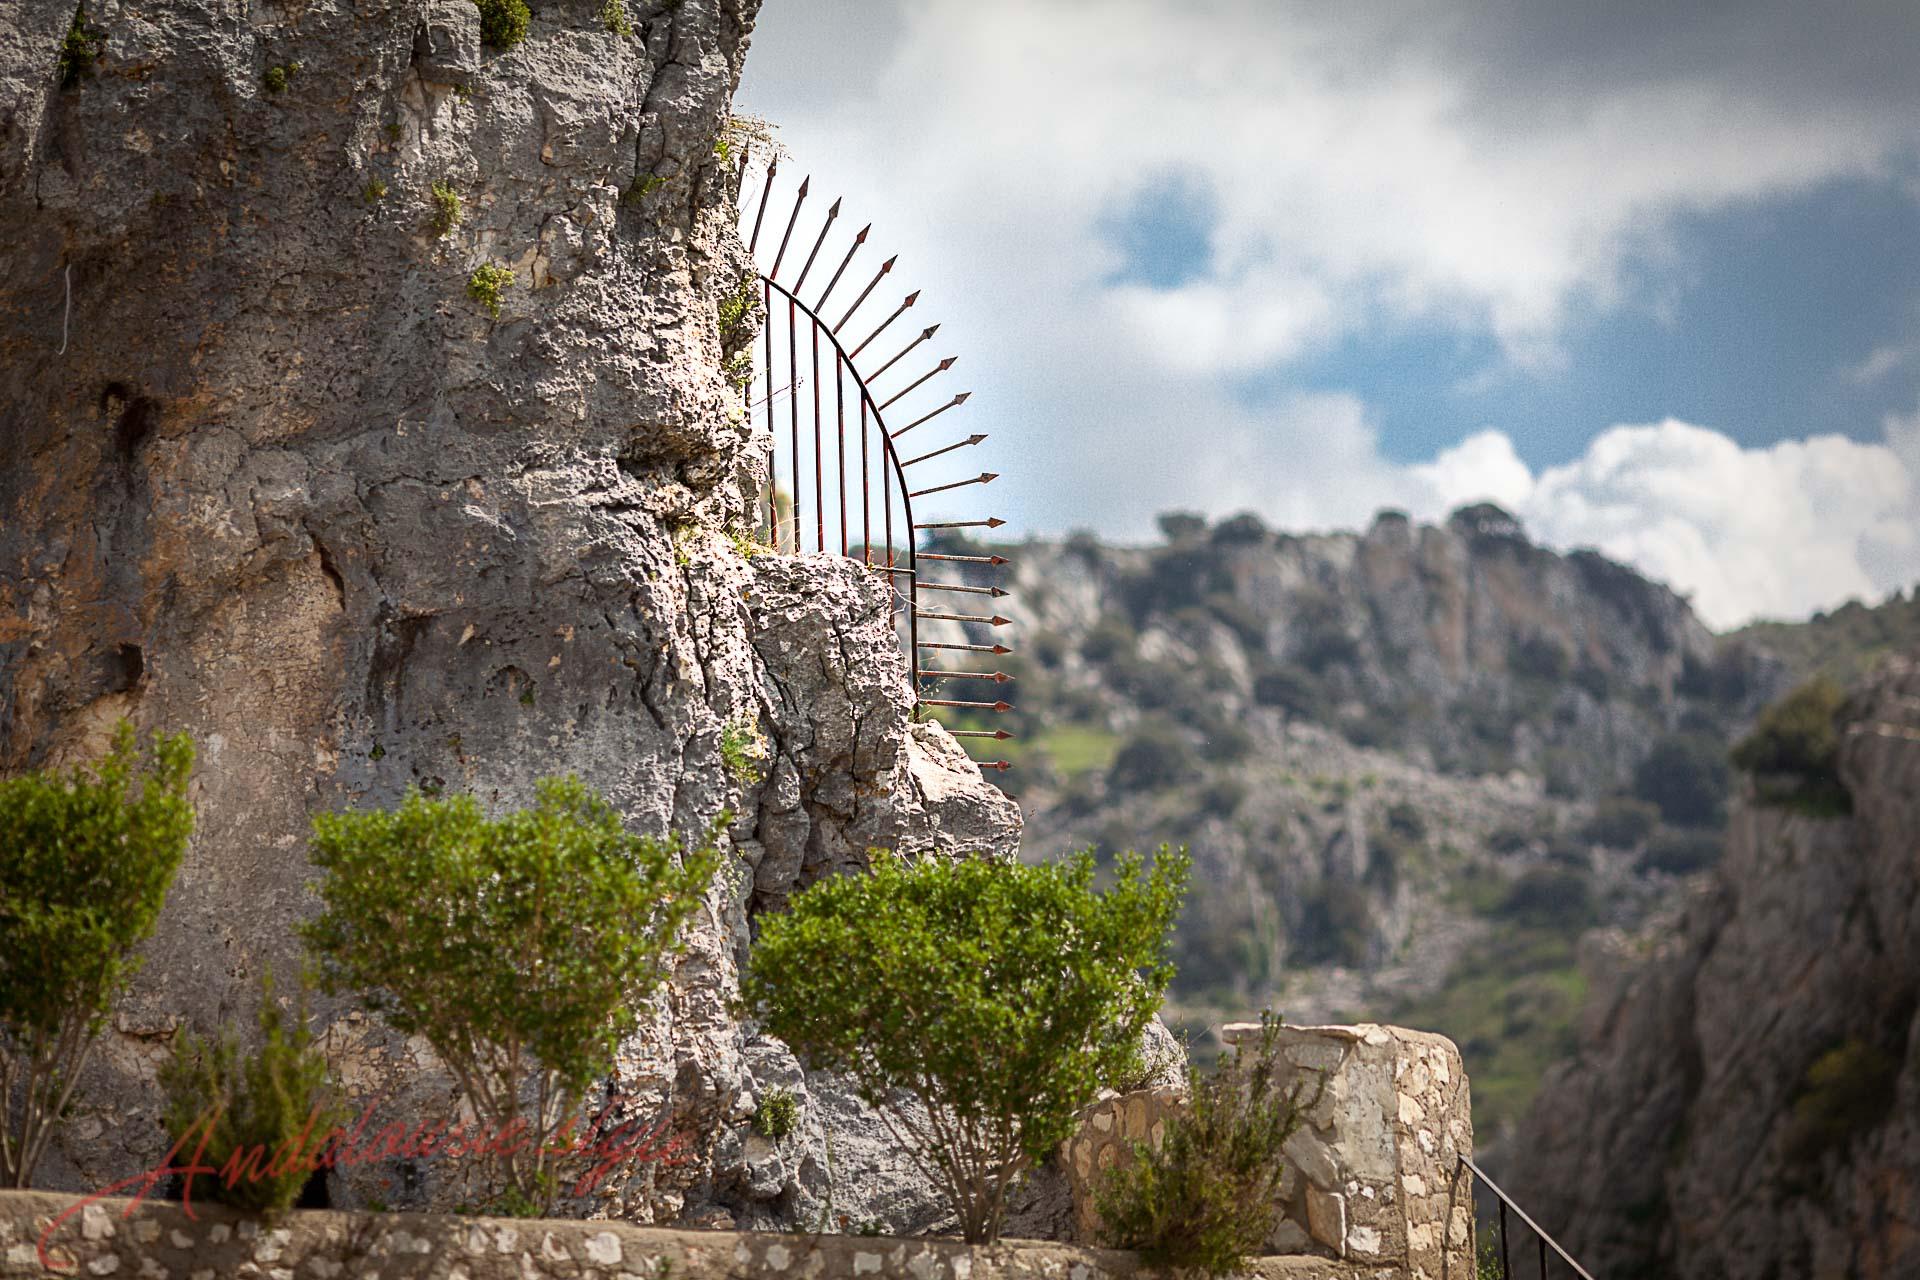 Carte Zuheros Espagne.Zuheros Nos Conseils Pour Visiter Ce Magnifique Village Blanc